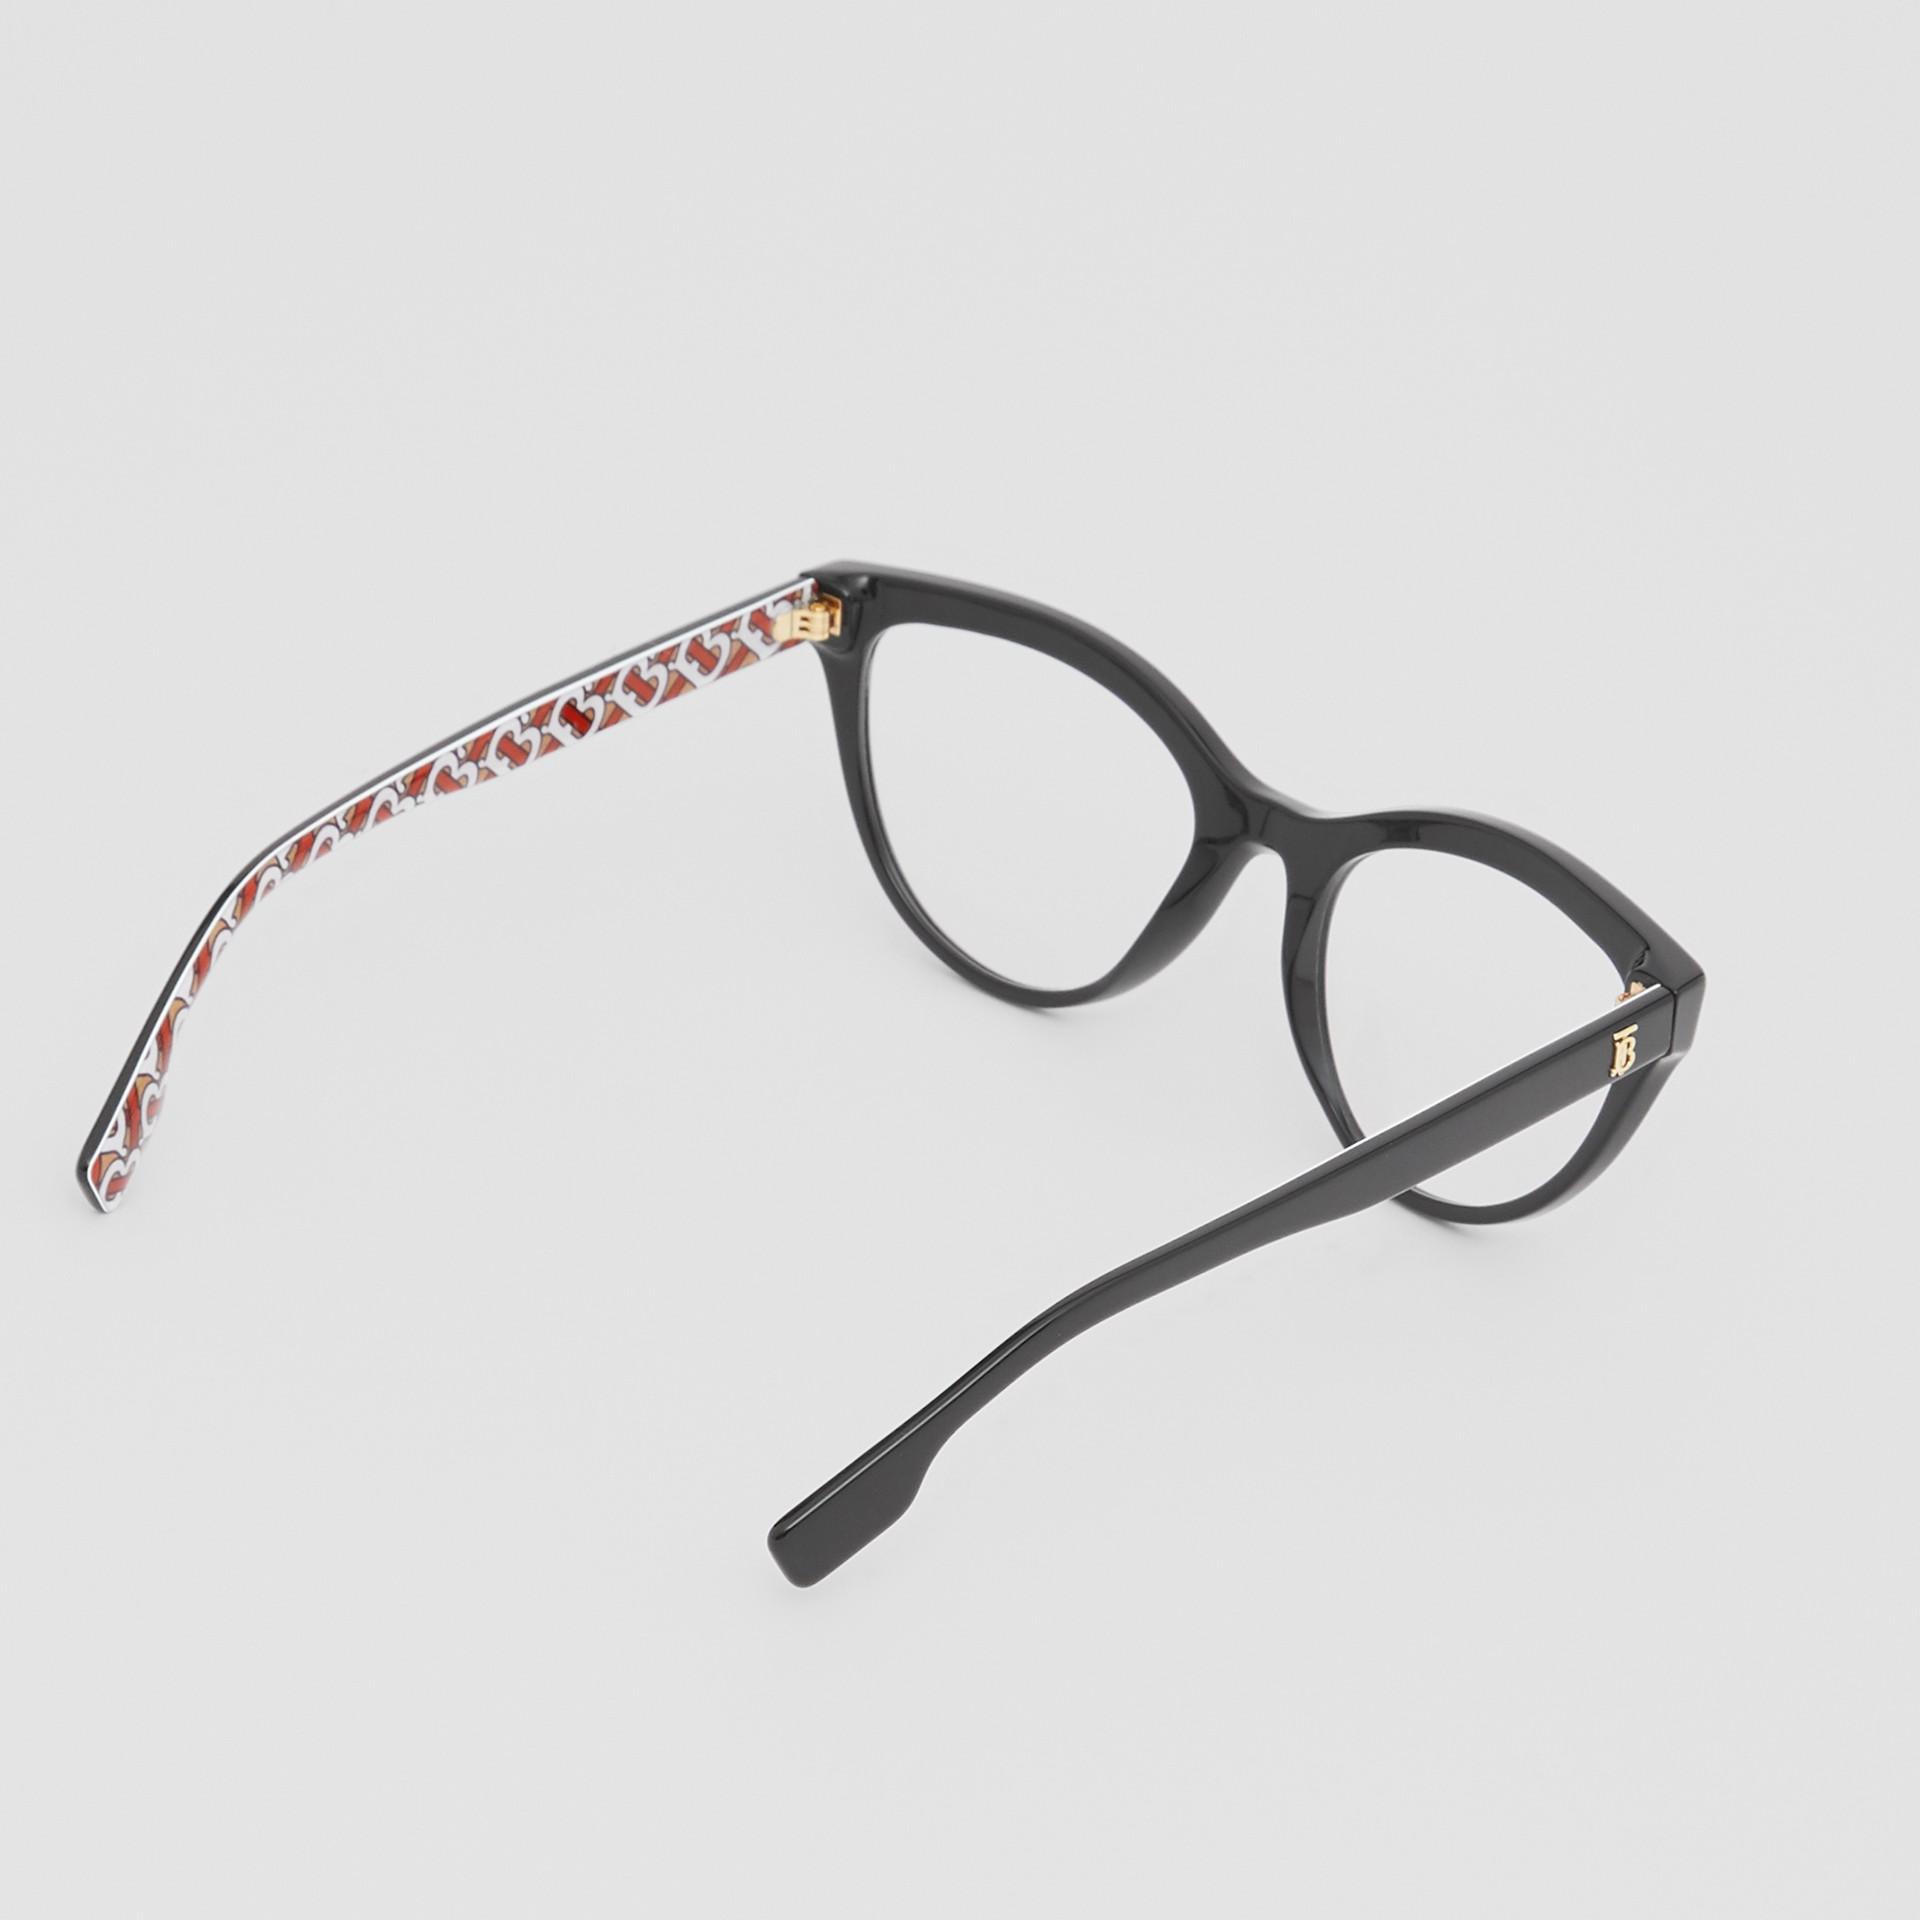 Monogram Print Detail Cat-eye Optical Frames in Black/vermilion - Women | Burberry - gallery image 4